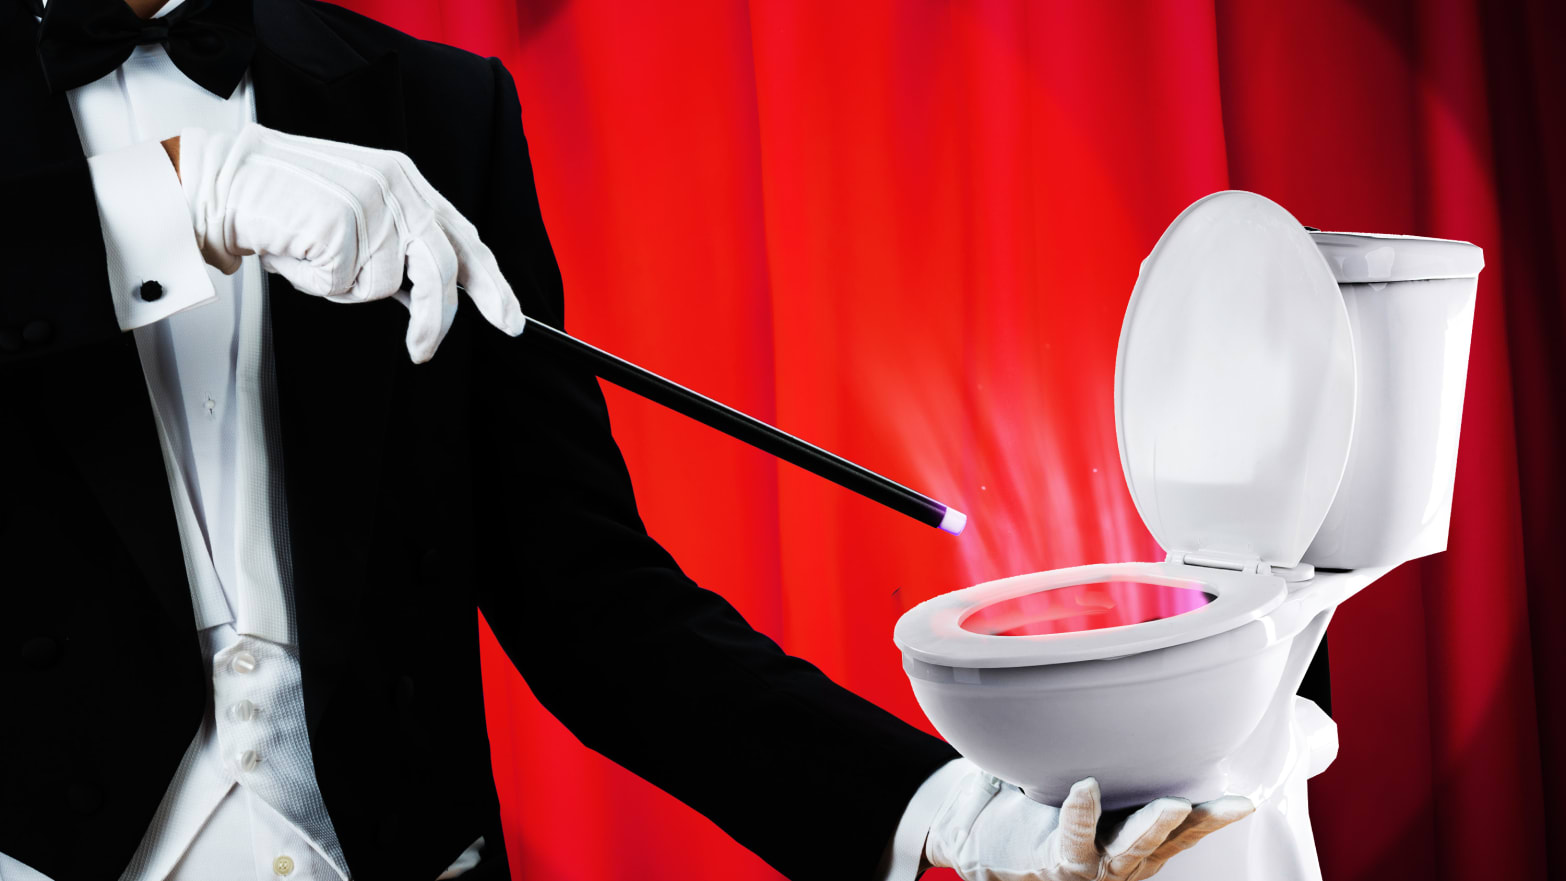 A Toilet That Vaporizes Your Poo